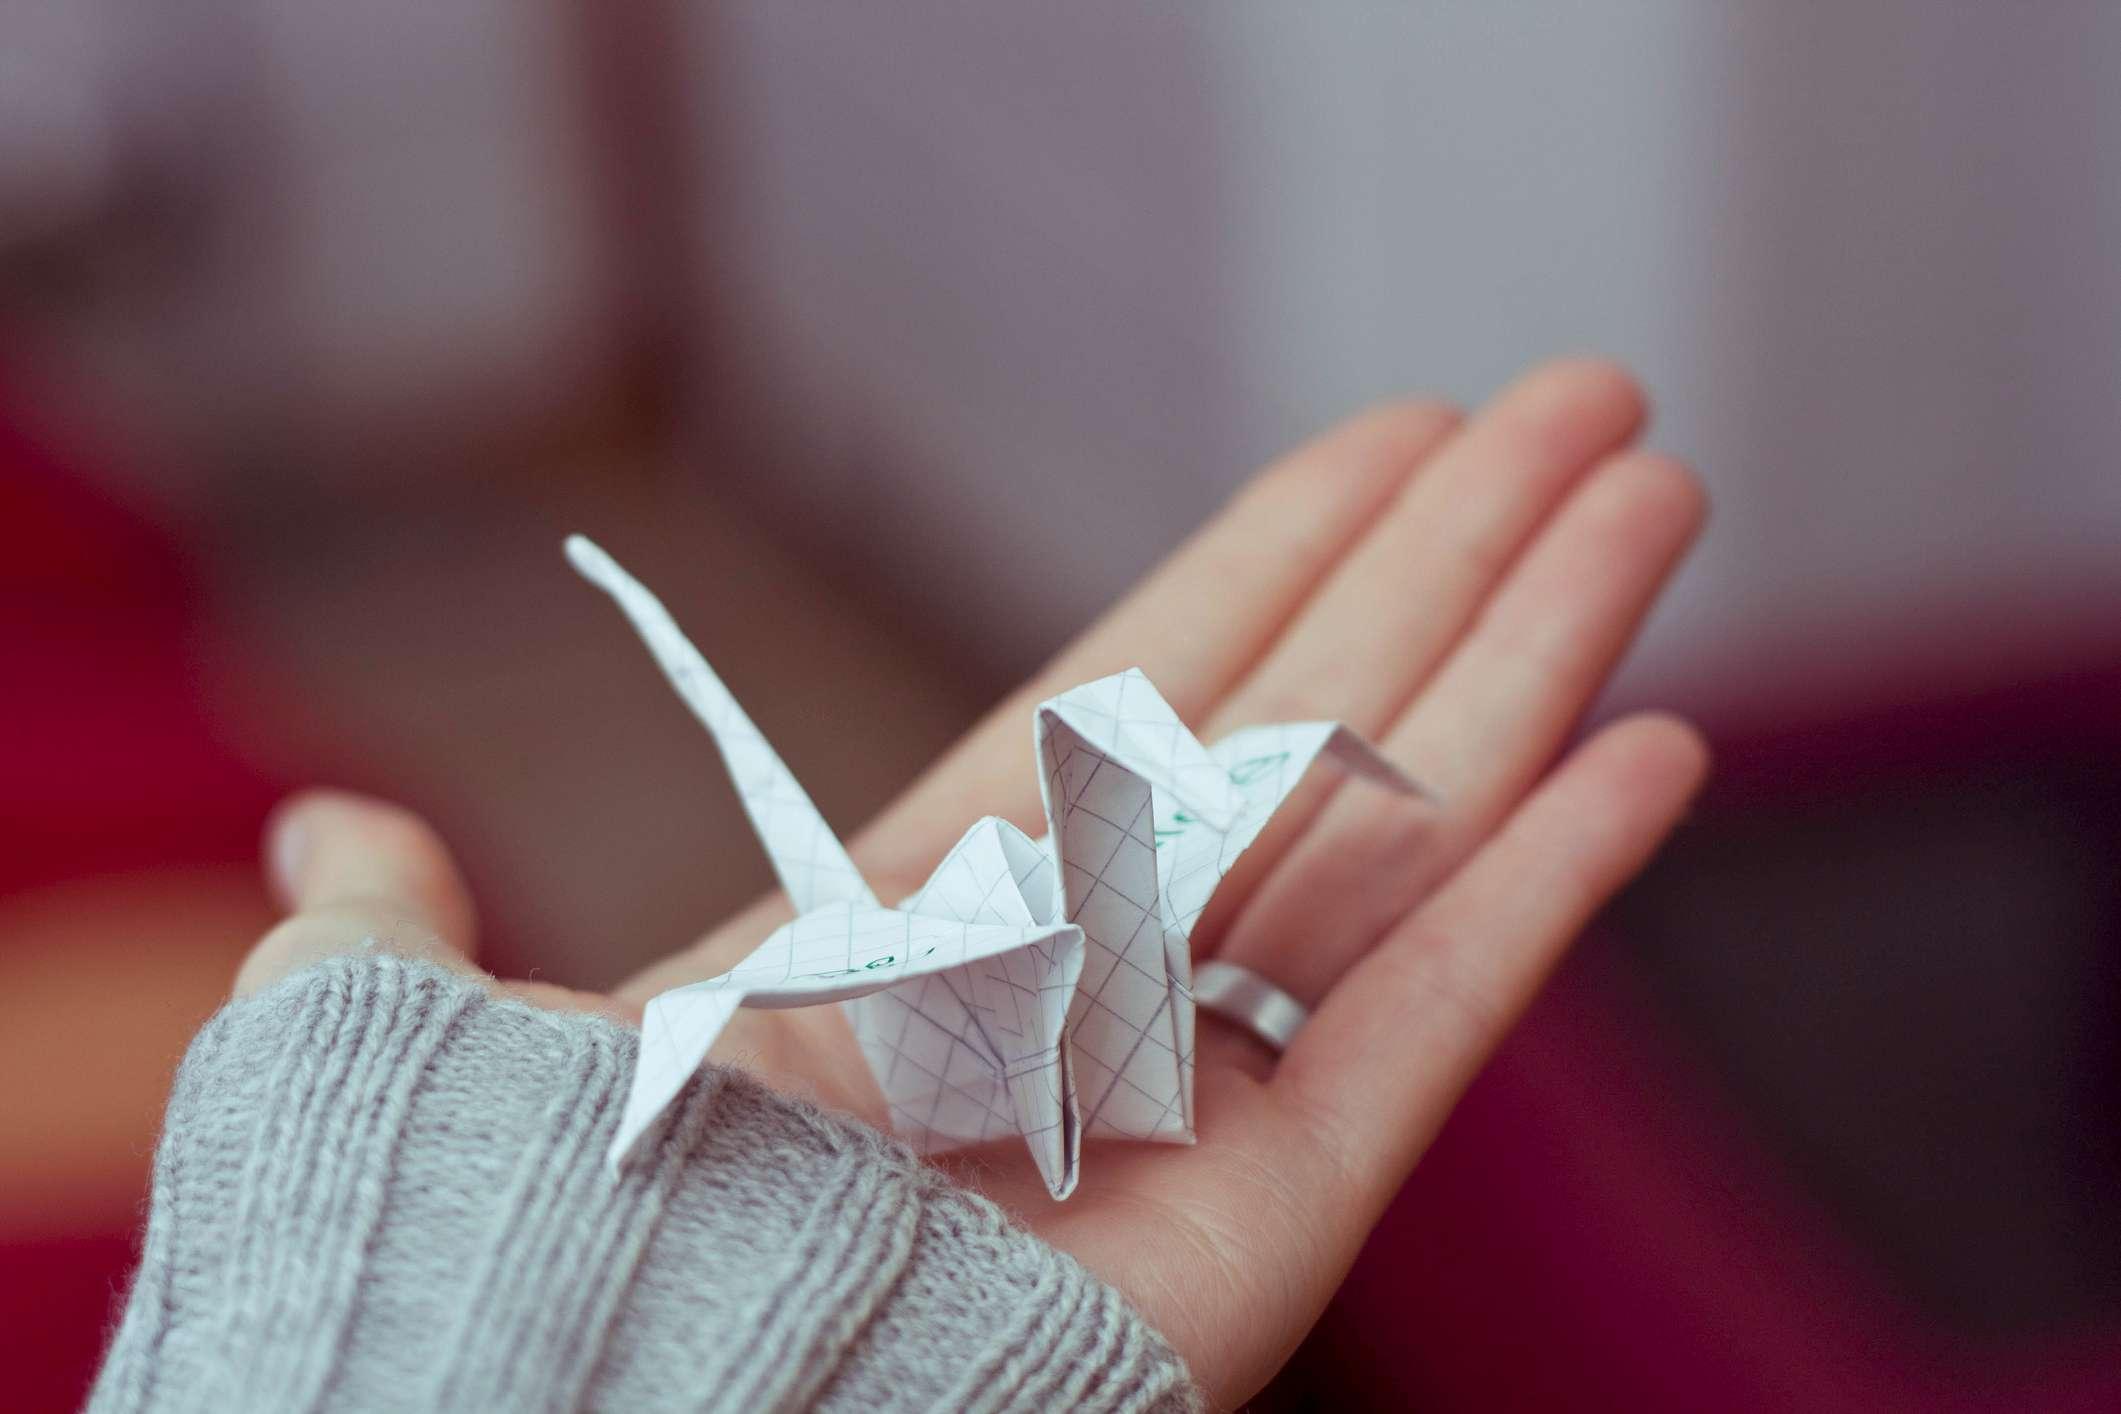 Paper crane on open palm